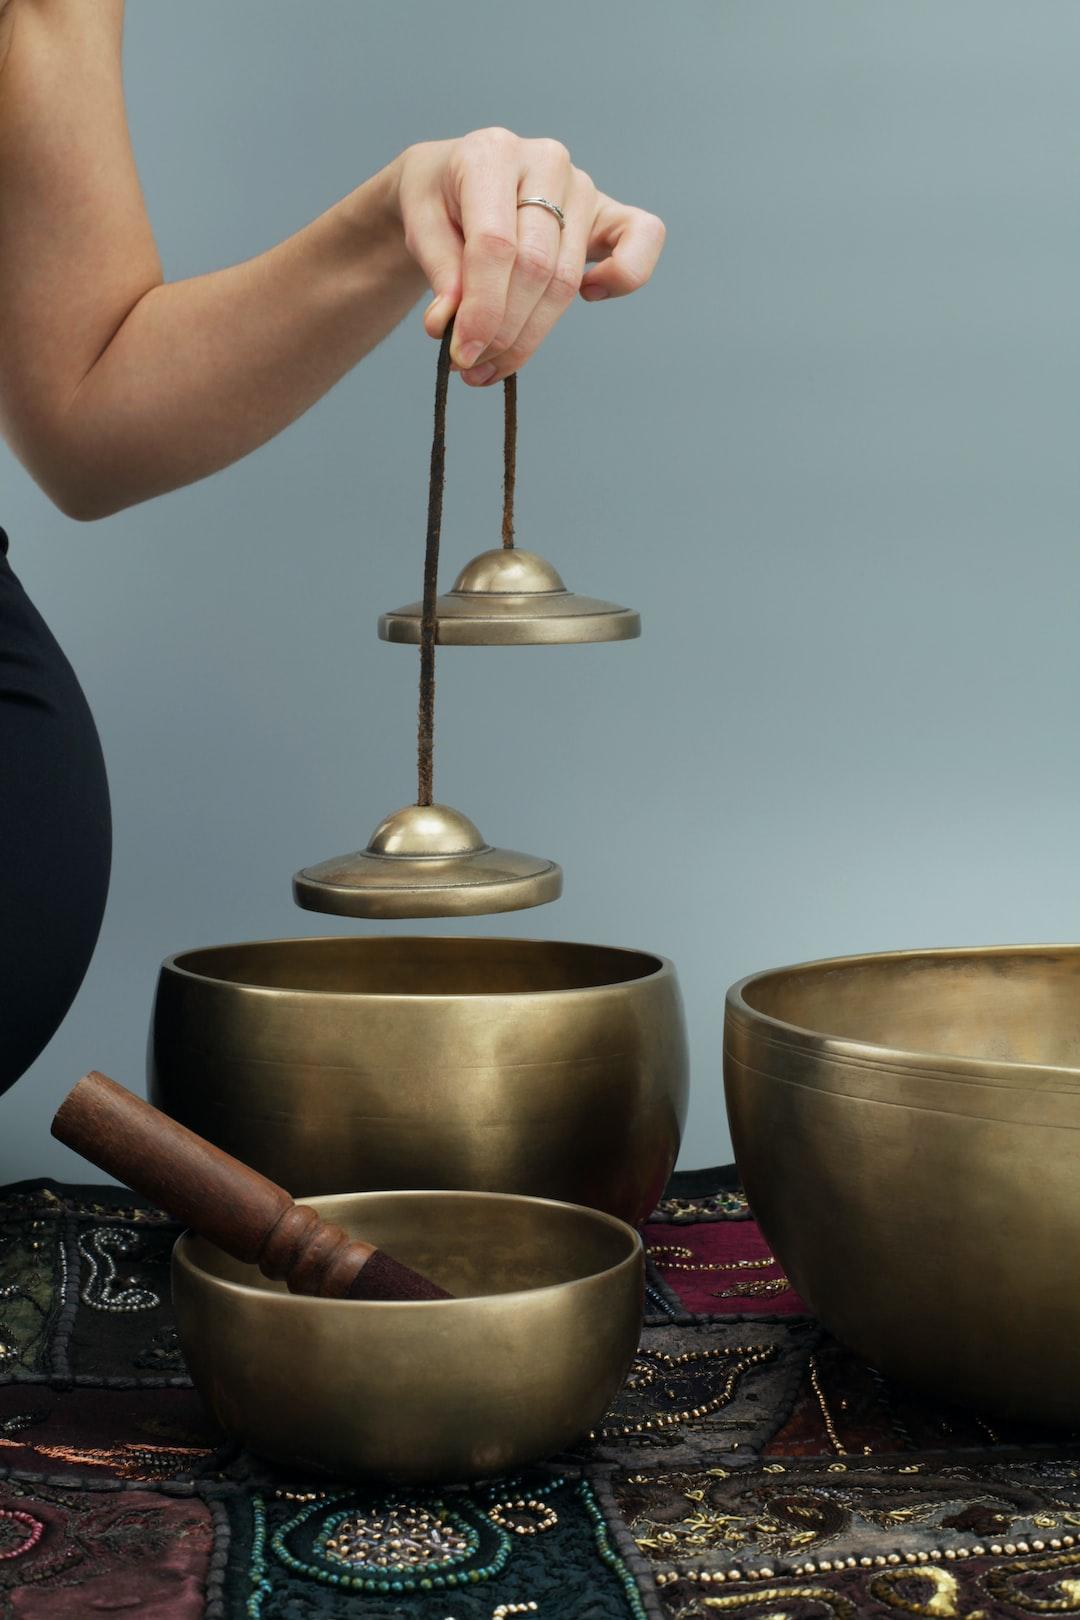 Tibetan Tingsha & singing bowls. Ancient Physical, Mental and Spiritual Practice